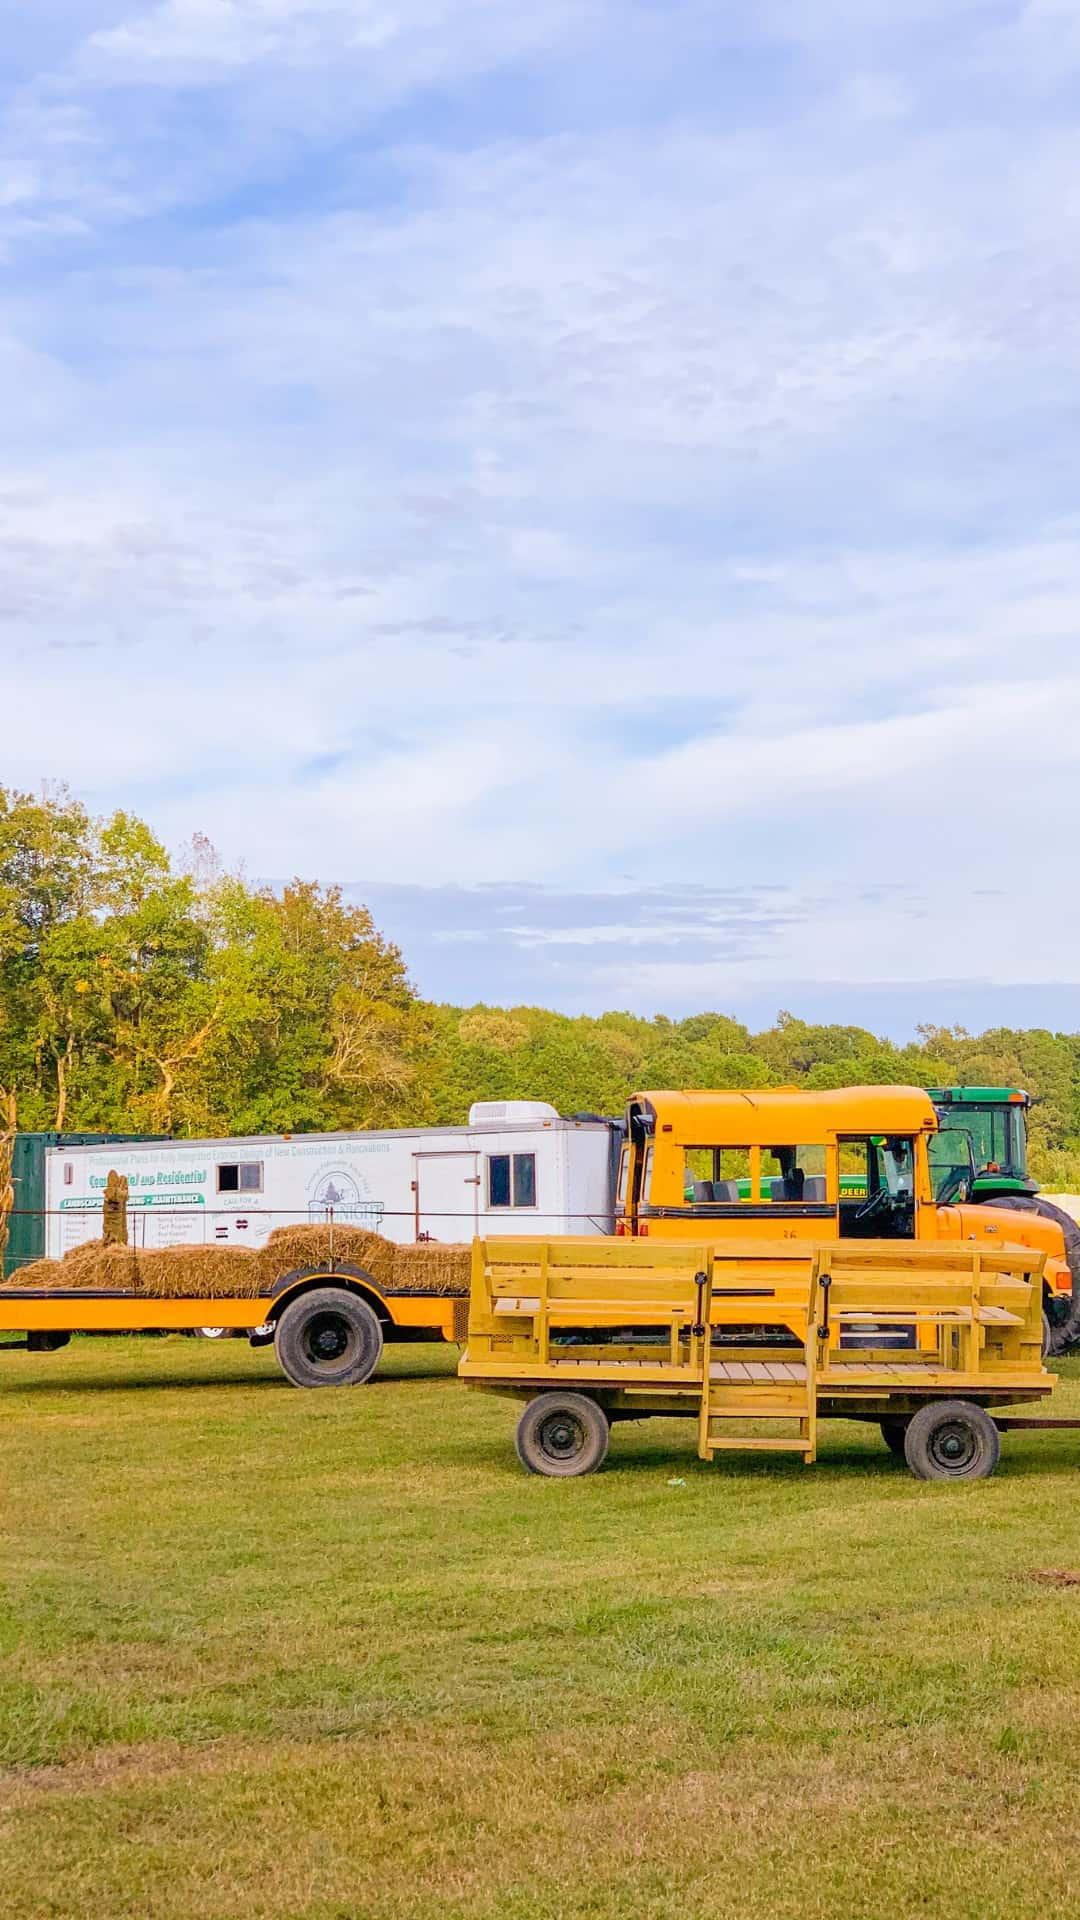 Fall iPhone Wallpaper Aesthetic Farm Hay Rides